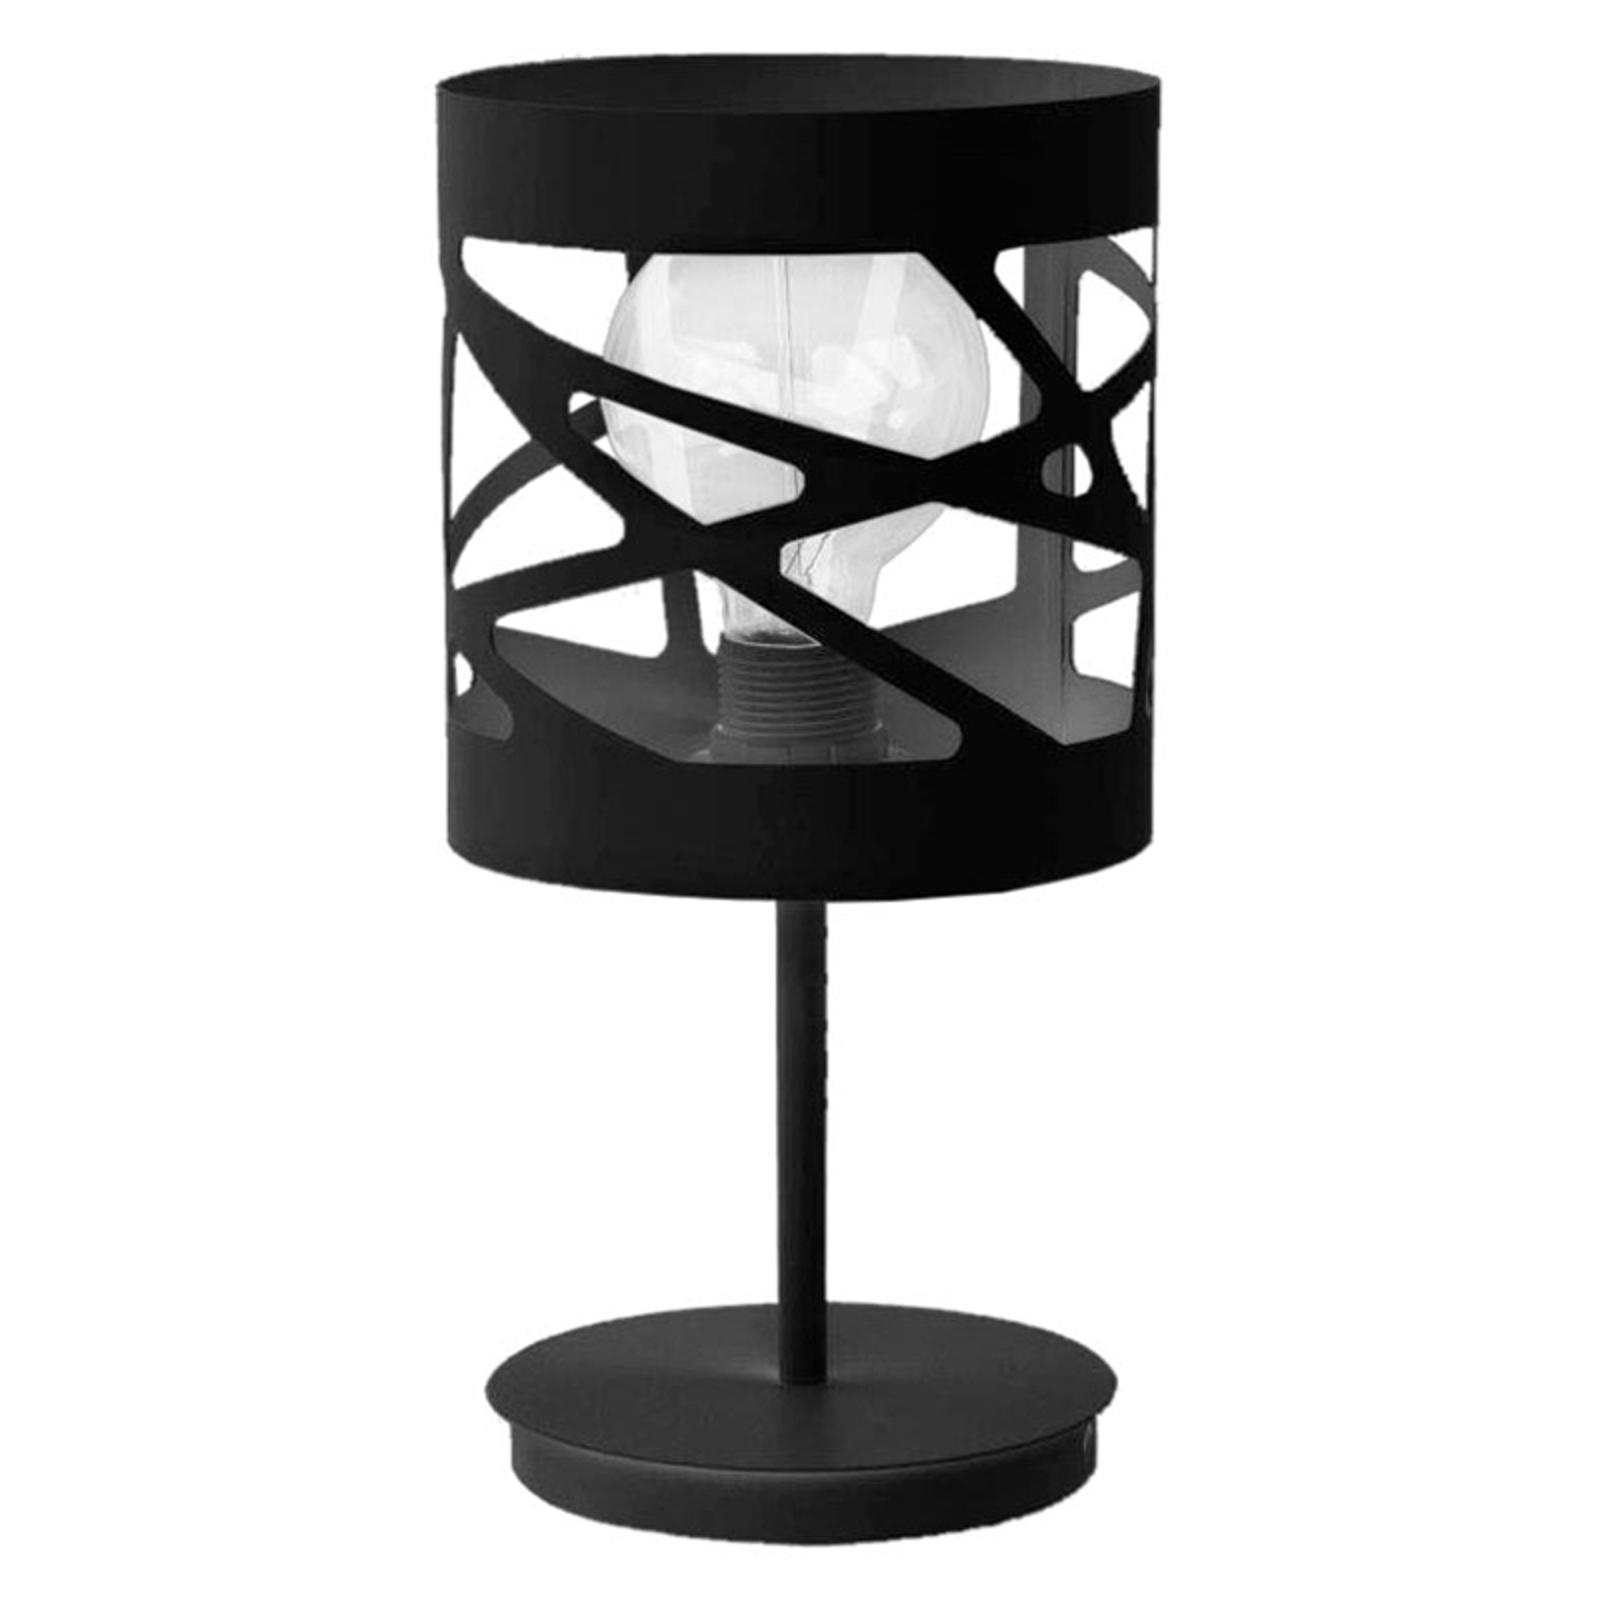 Tafellamp module Frez voorbeeldkap Ø17,5cm zwart